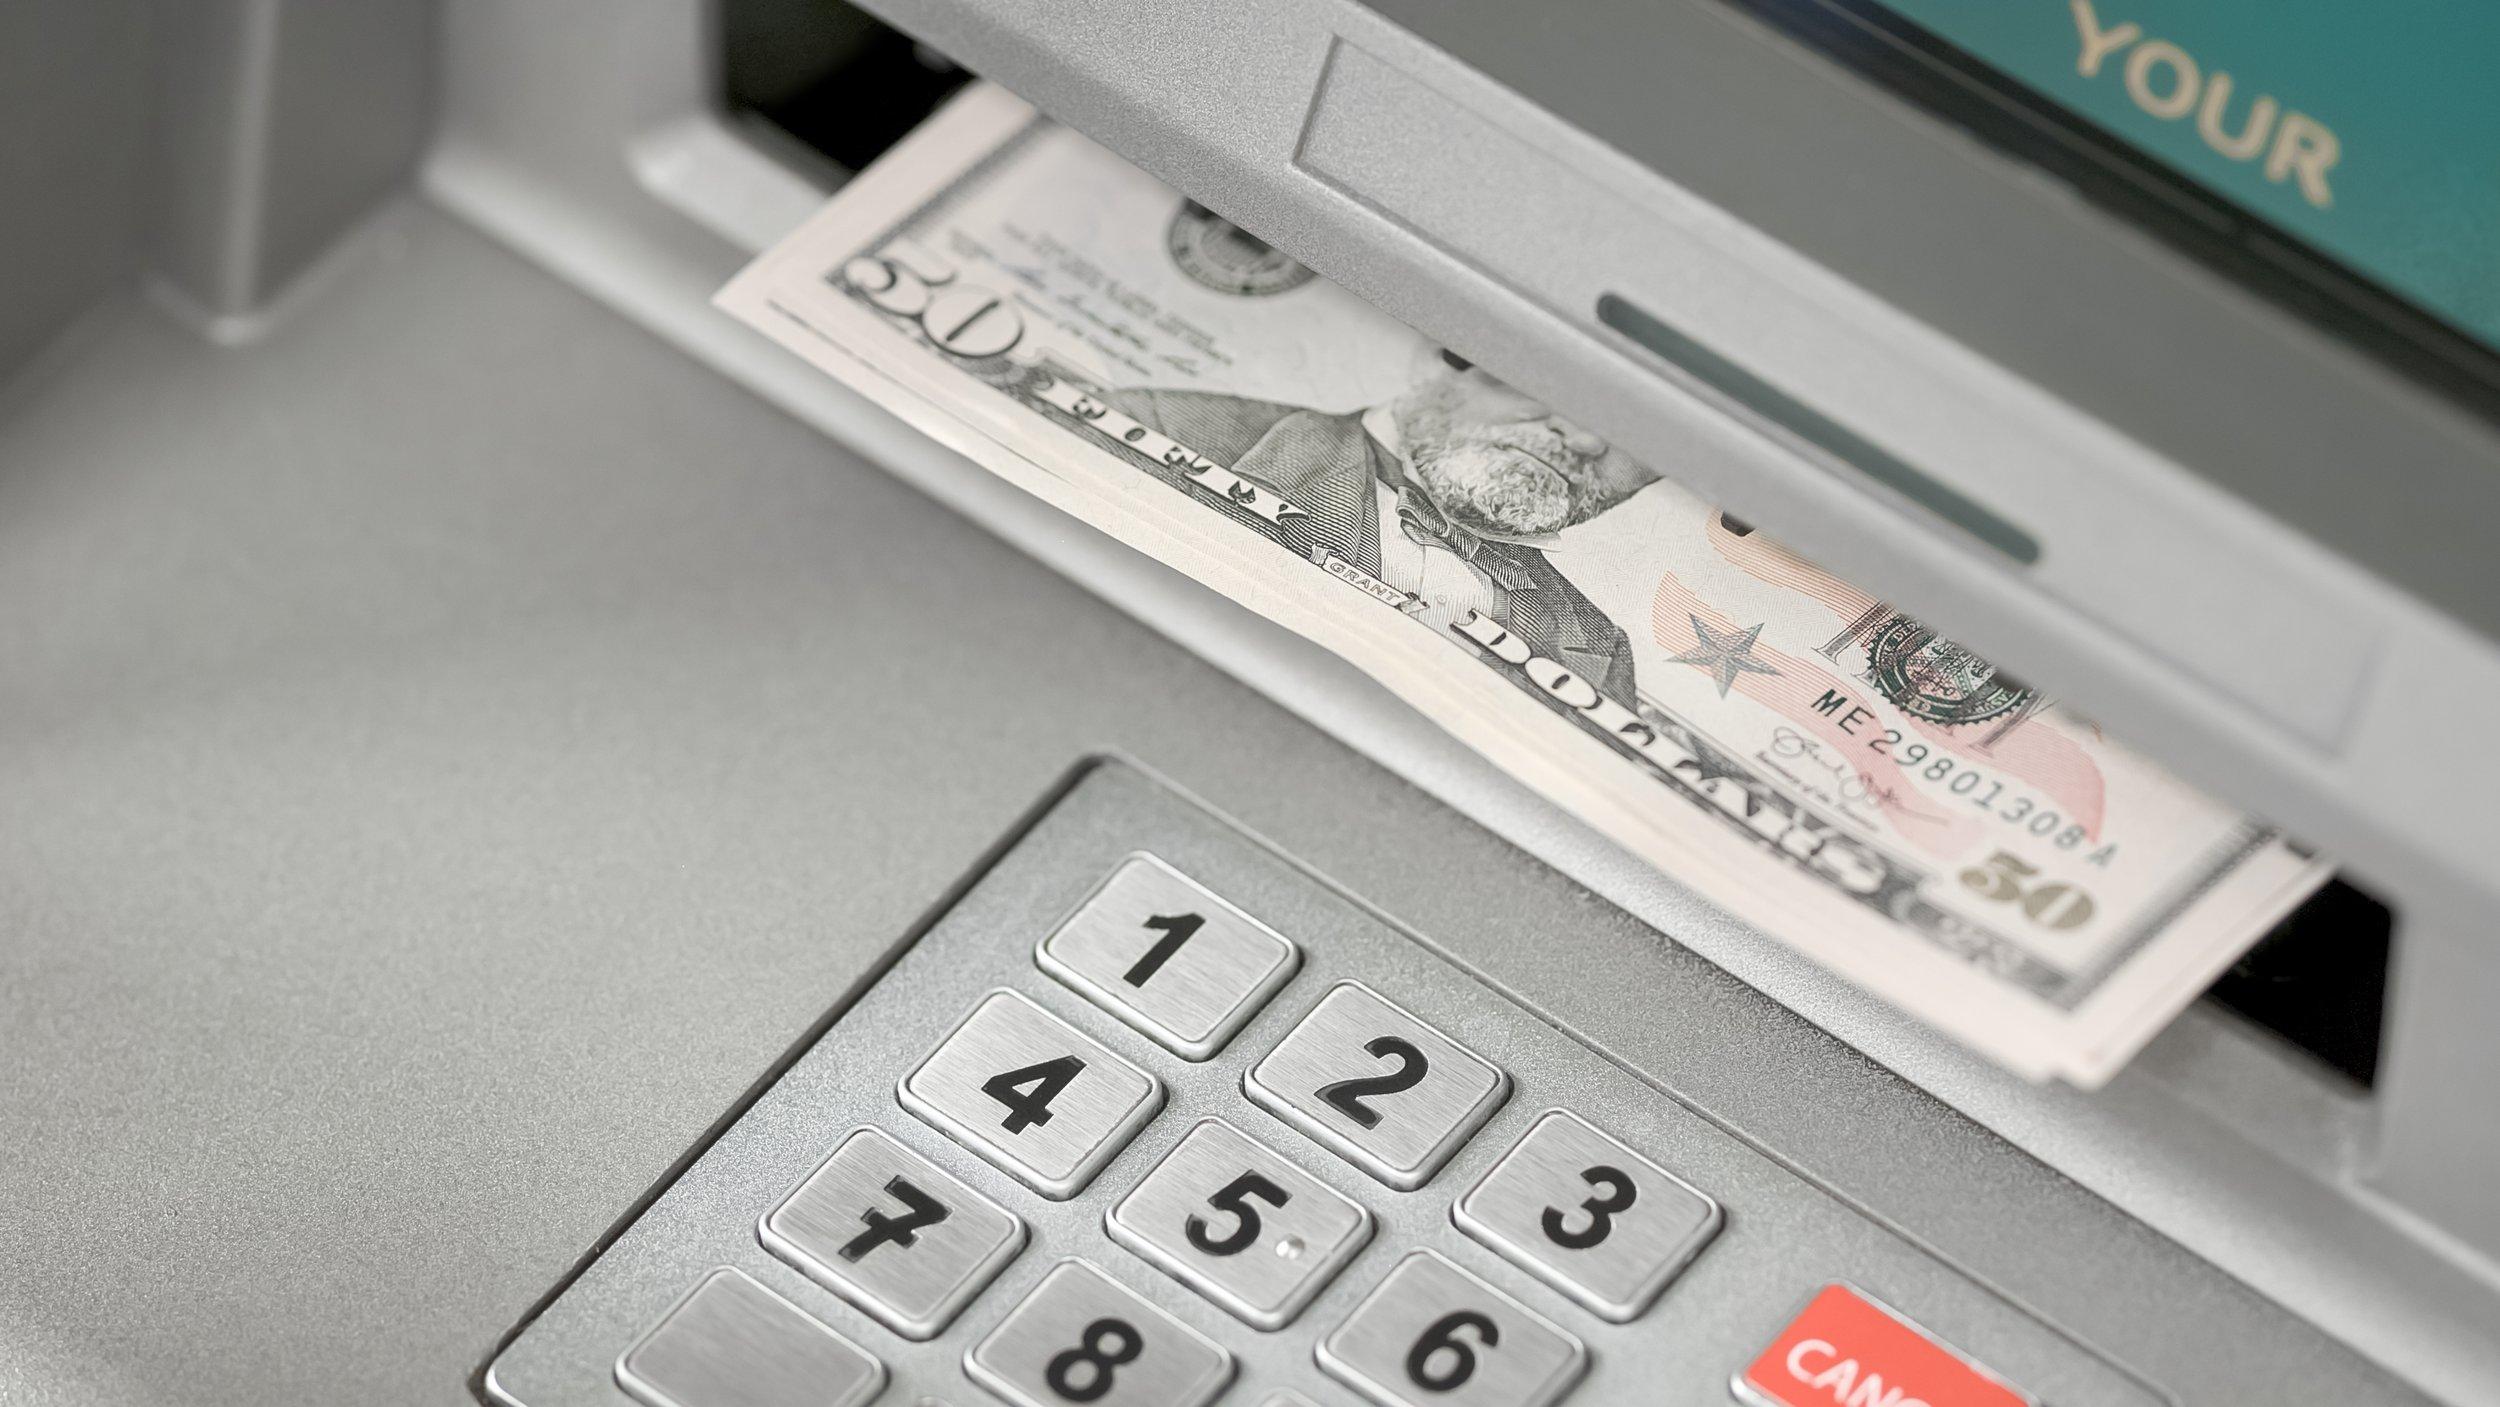 Erste banka bankomat | Varaždin | Supernova